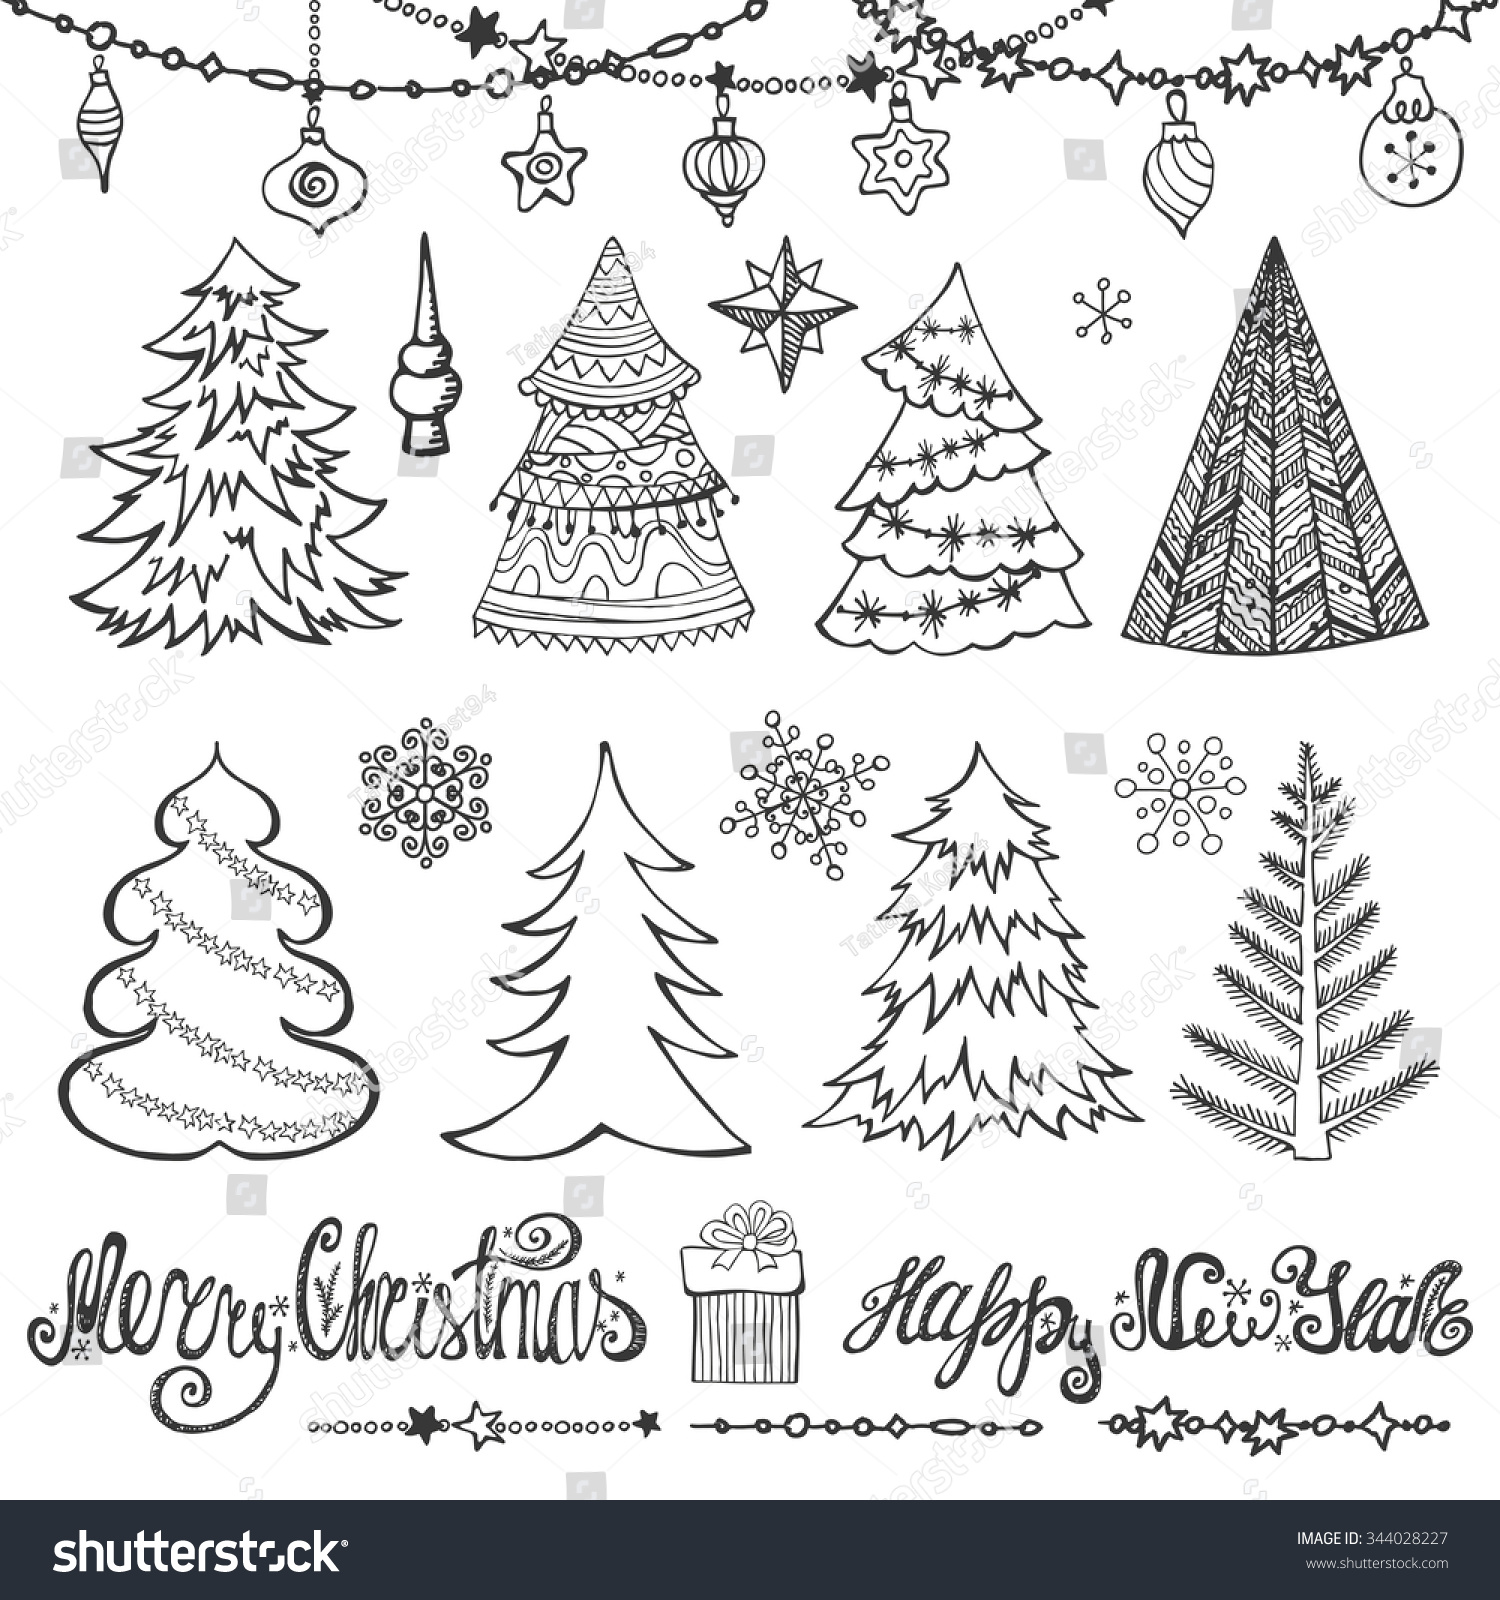 Christmas Treeballslettering Hand Drawn Doodle Decoration ...